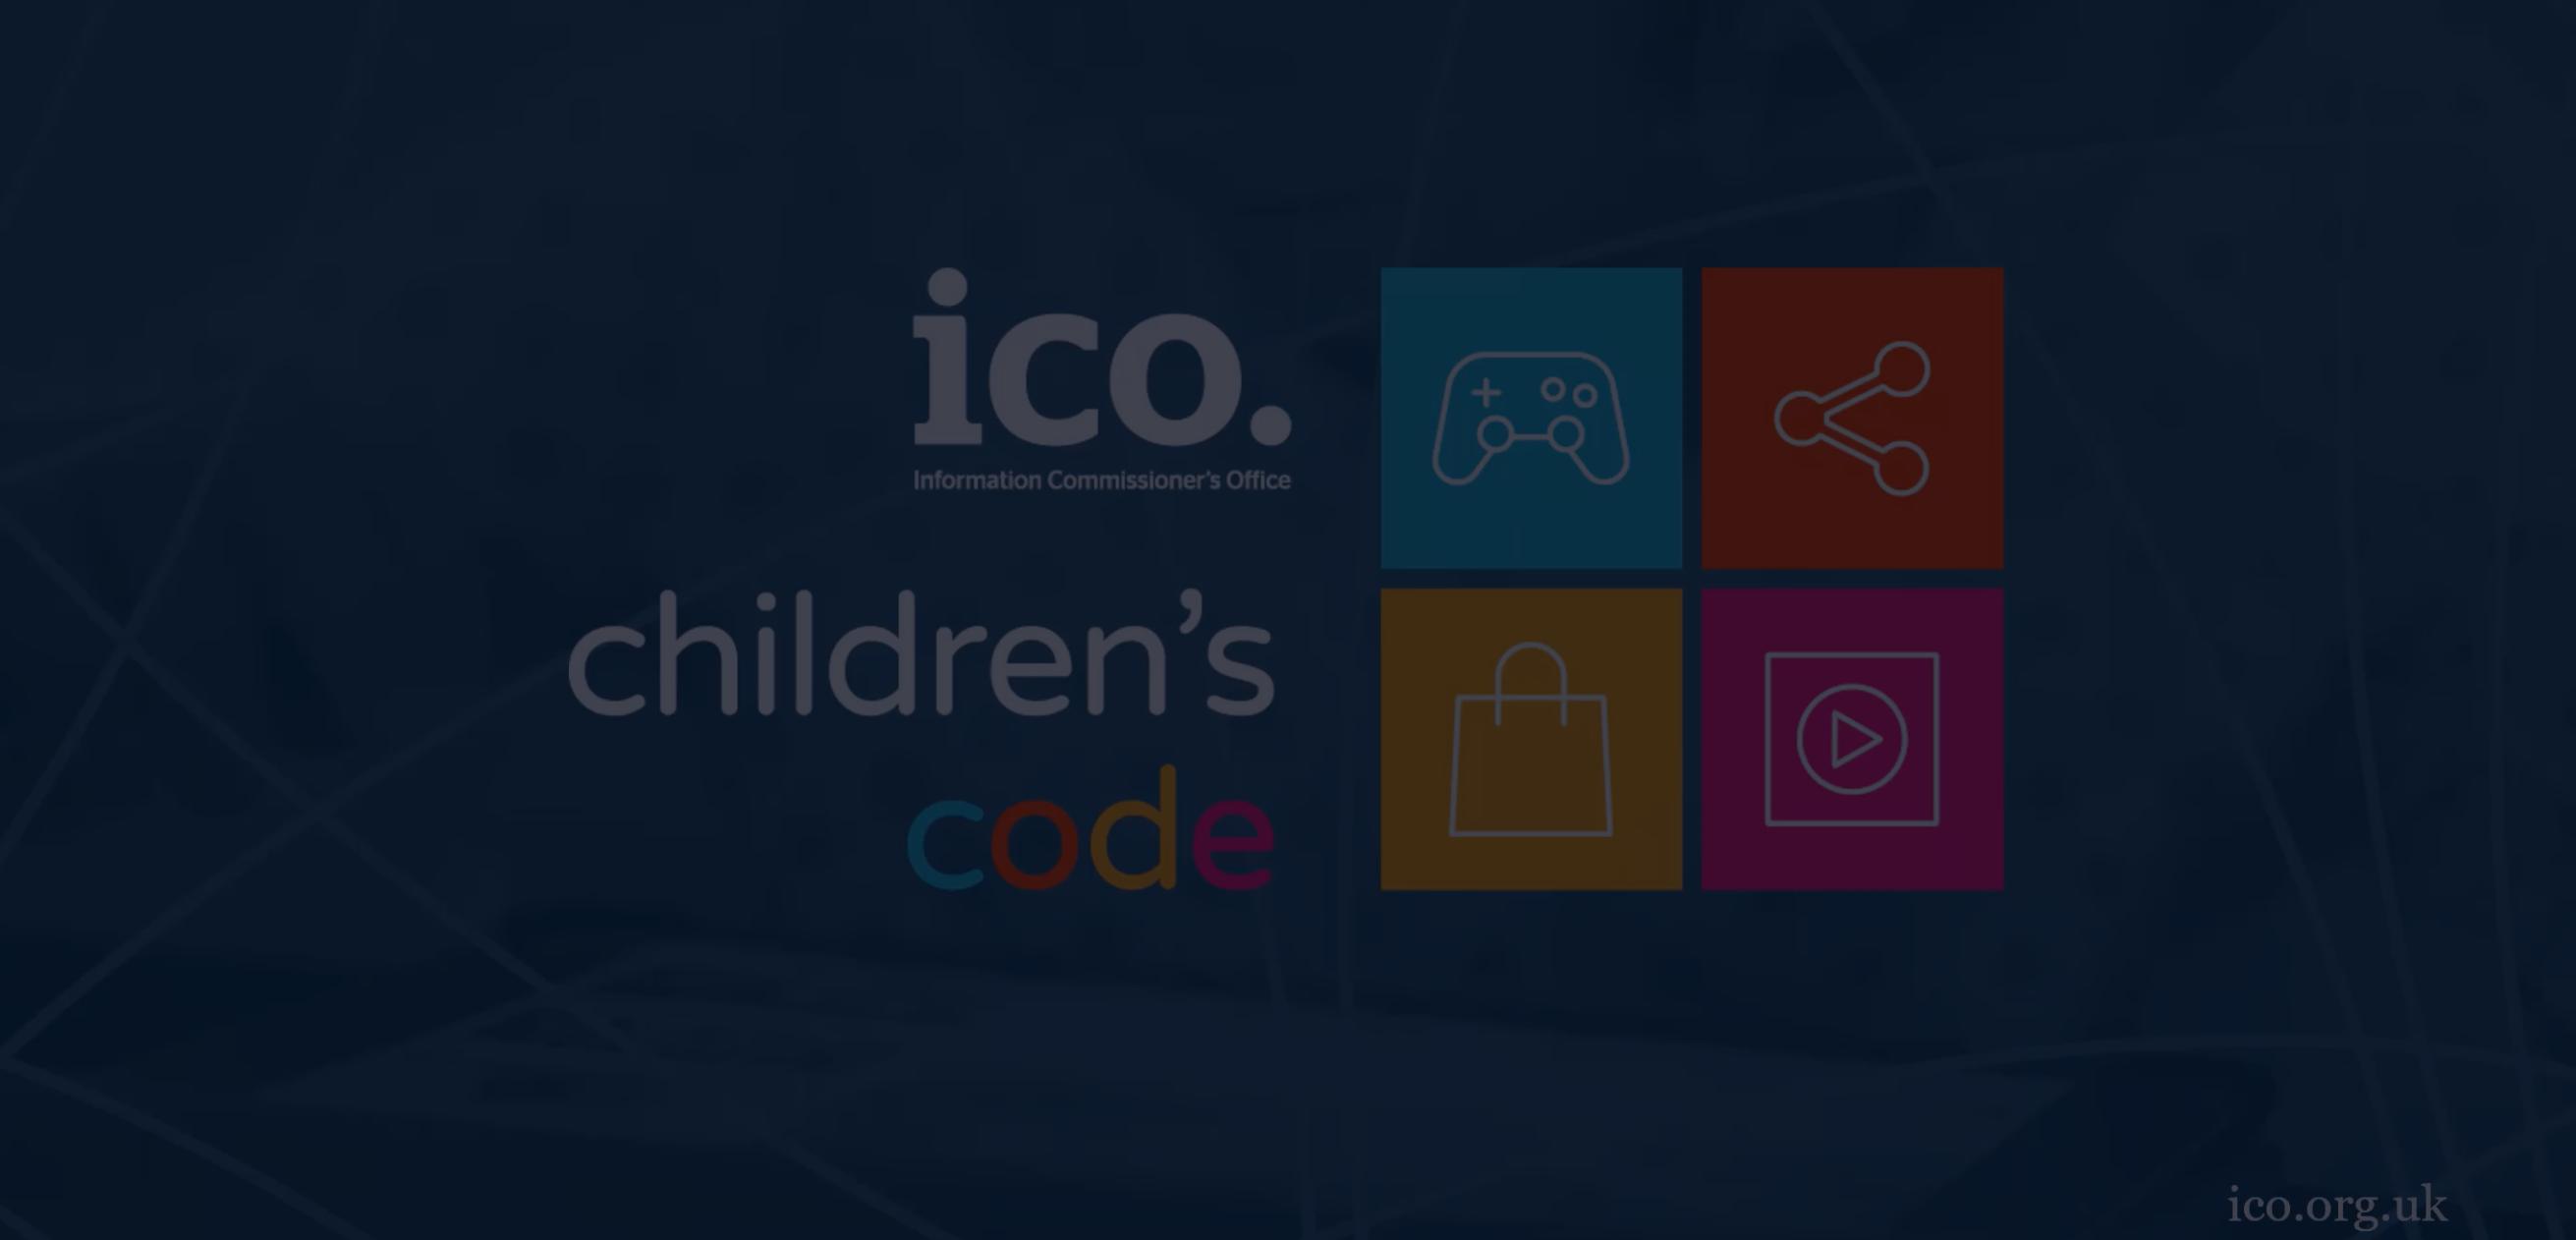 ICO Children's Code Webinar